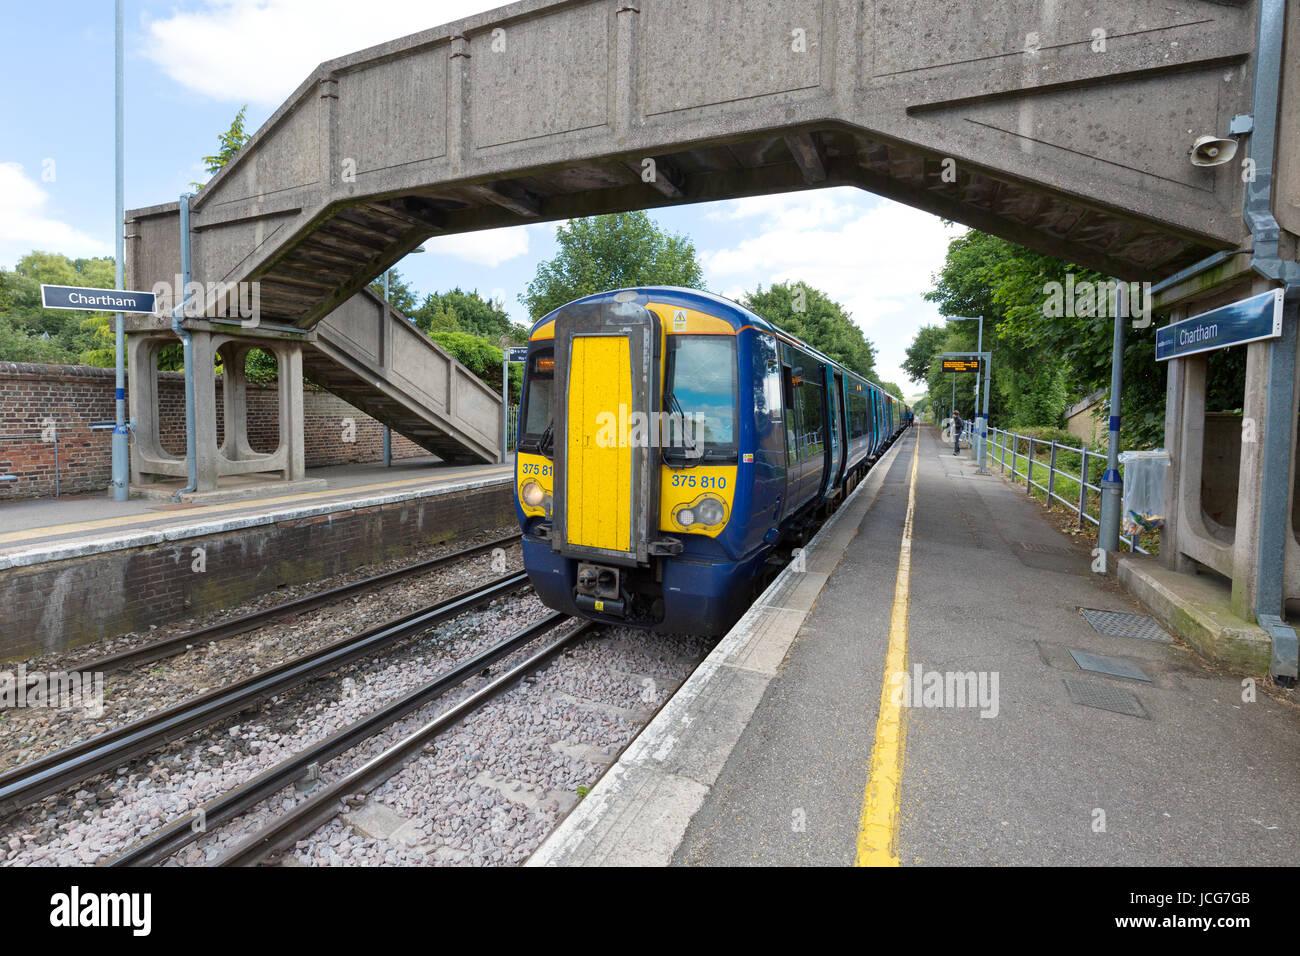 A train in Chartham village station, Chartham, Canterbury, Kent UK - Stock Image